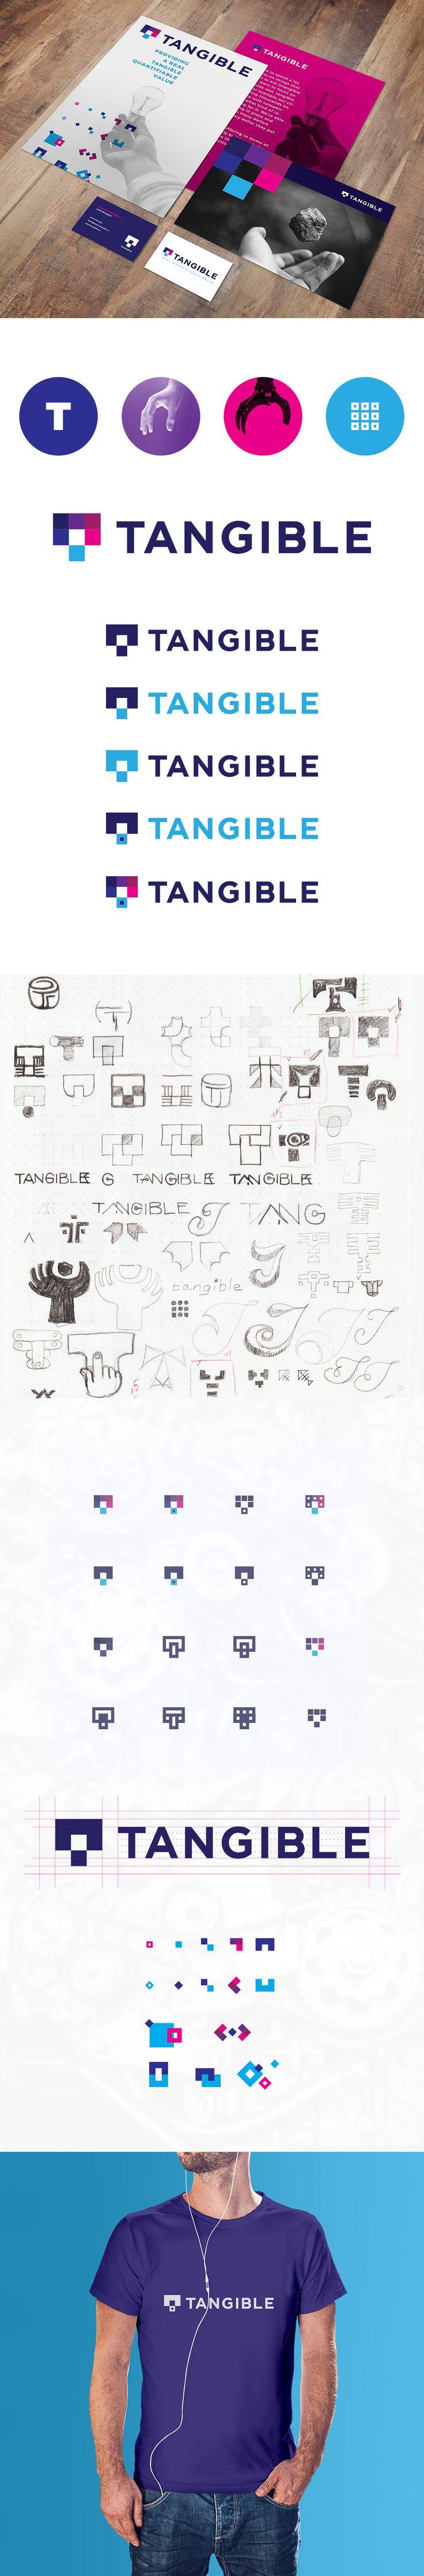 Custom logo design project for Tangible web development IT company.